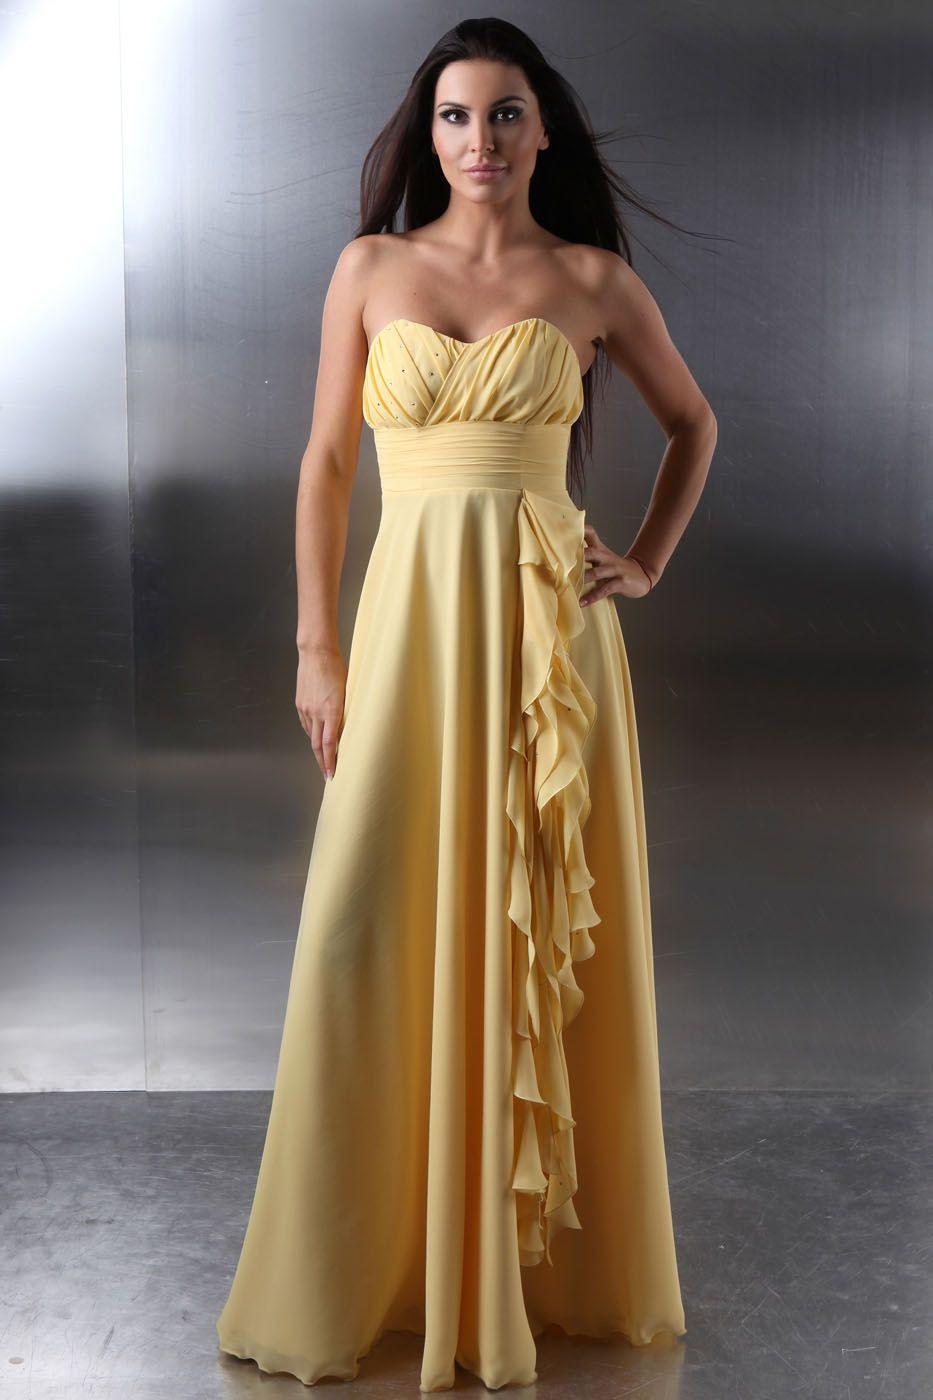 Designer Top Abendkleid Gelb Bester Preis17 Kreativ Abendkleid Gelb Boutique